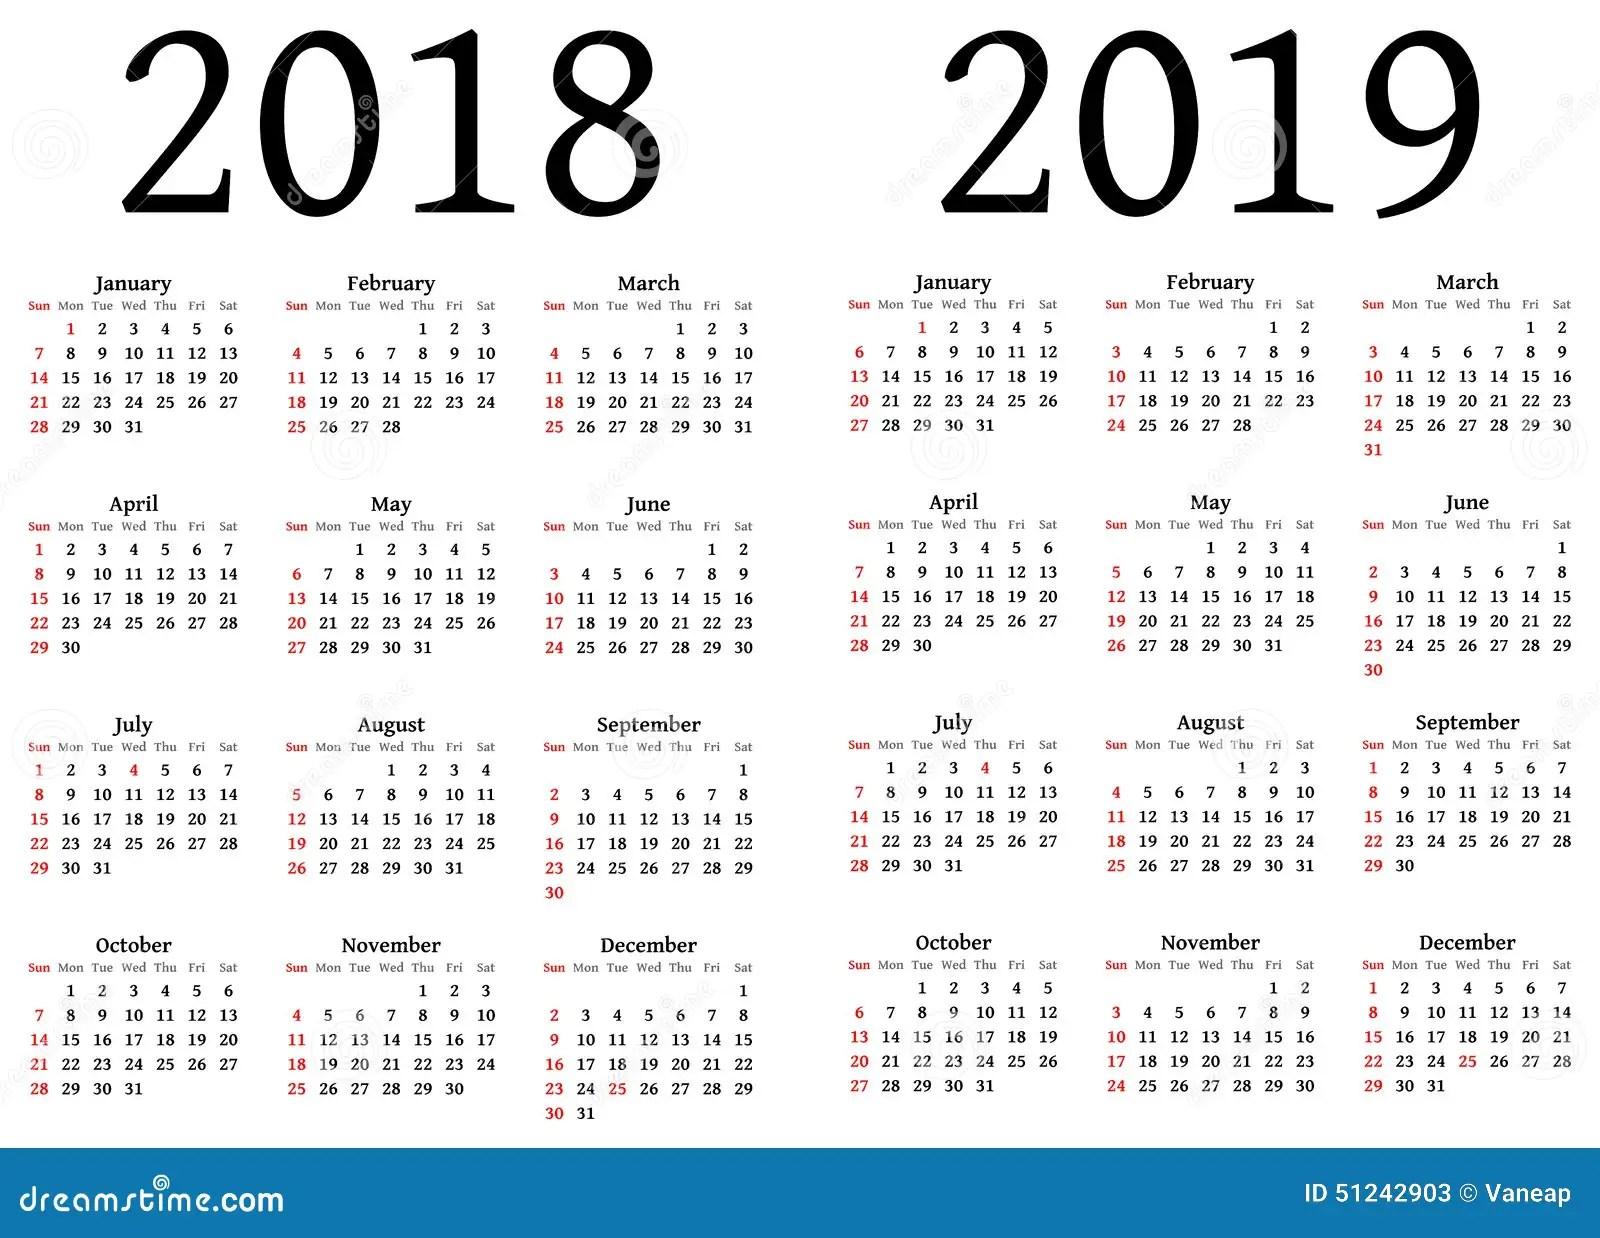 2014 Julian Calendar Is Based Julian Sands Imdb Calendar For 2018 And 2019 Stock Illustration Image